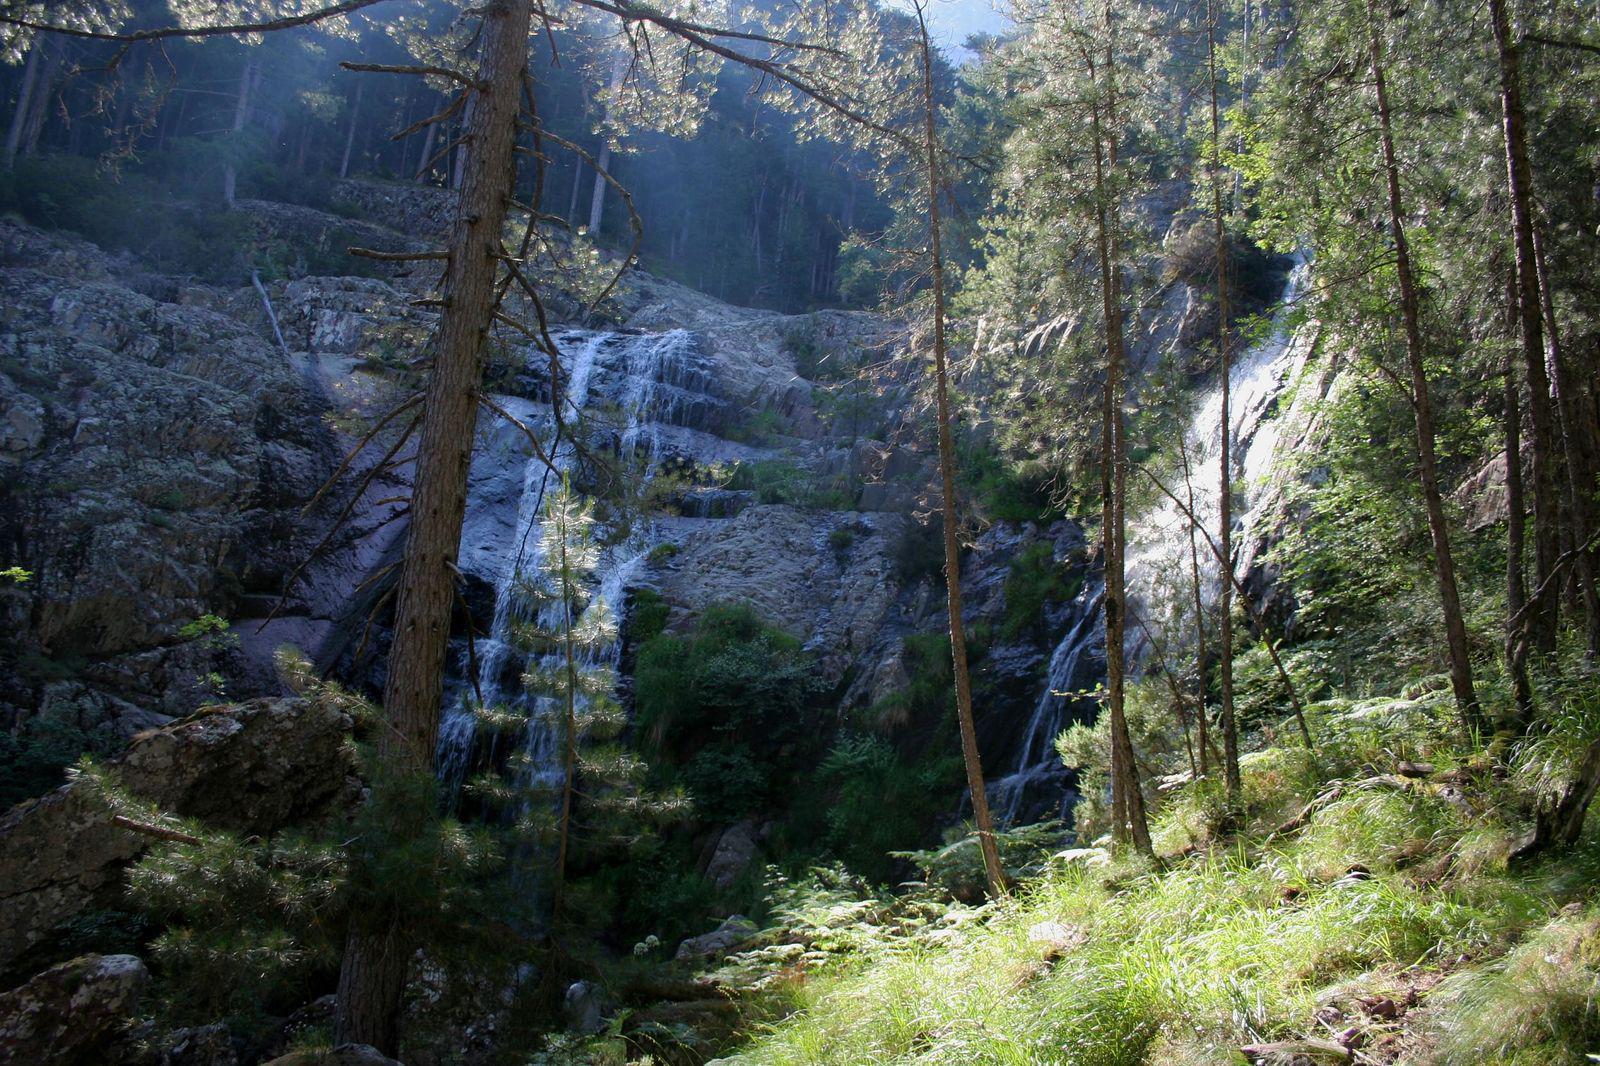 Cascades d'Aïtone